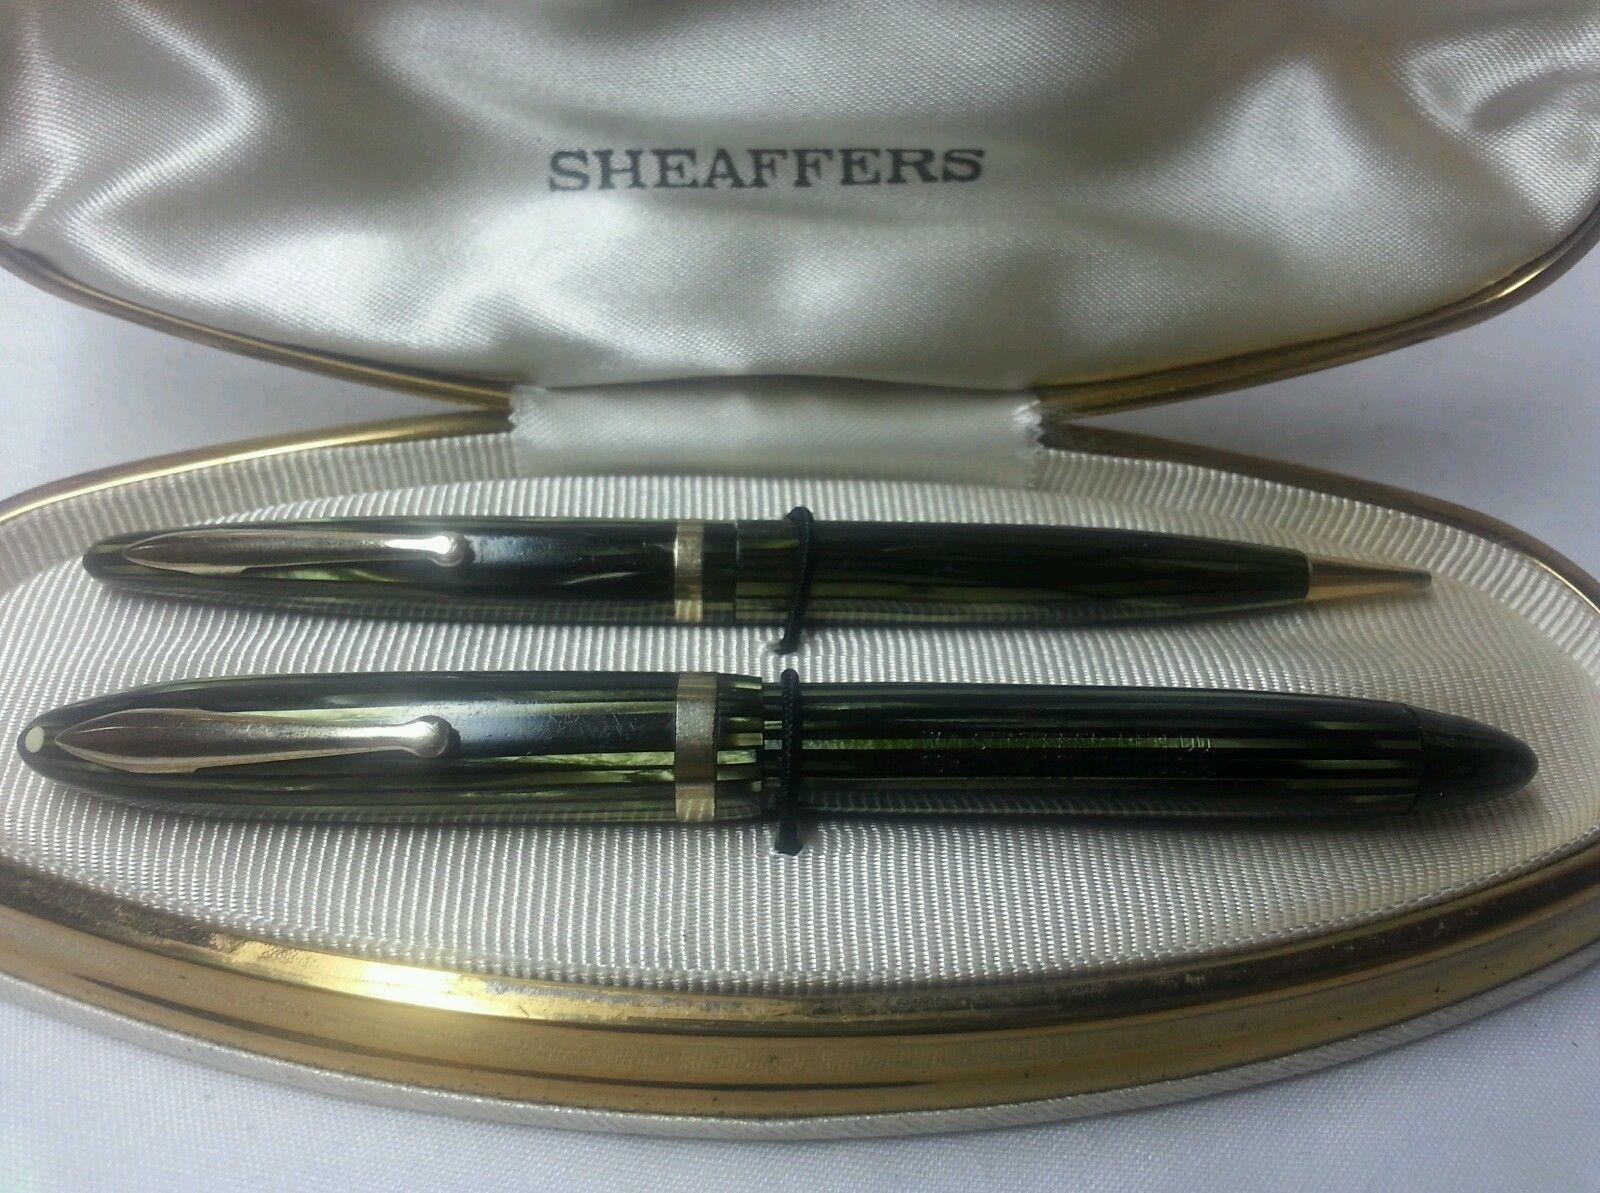 Striated Green Sheaffers 350 Pen Set With Original Clam Shell Box